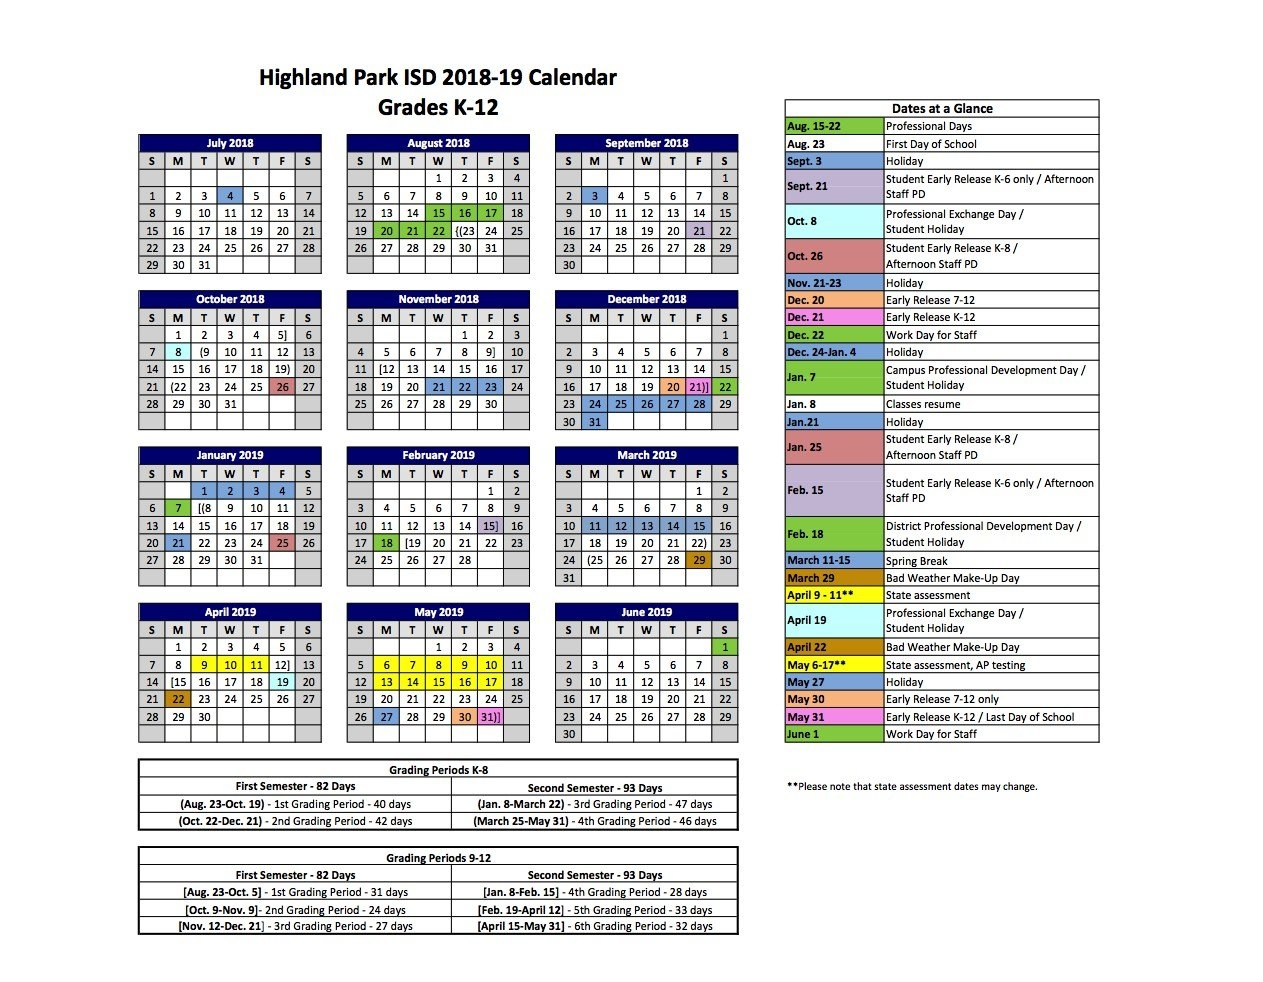 2018 2019 Hpisd Calendars – Calendars – Highland Park Independent Calendar 2019 Spring Break